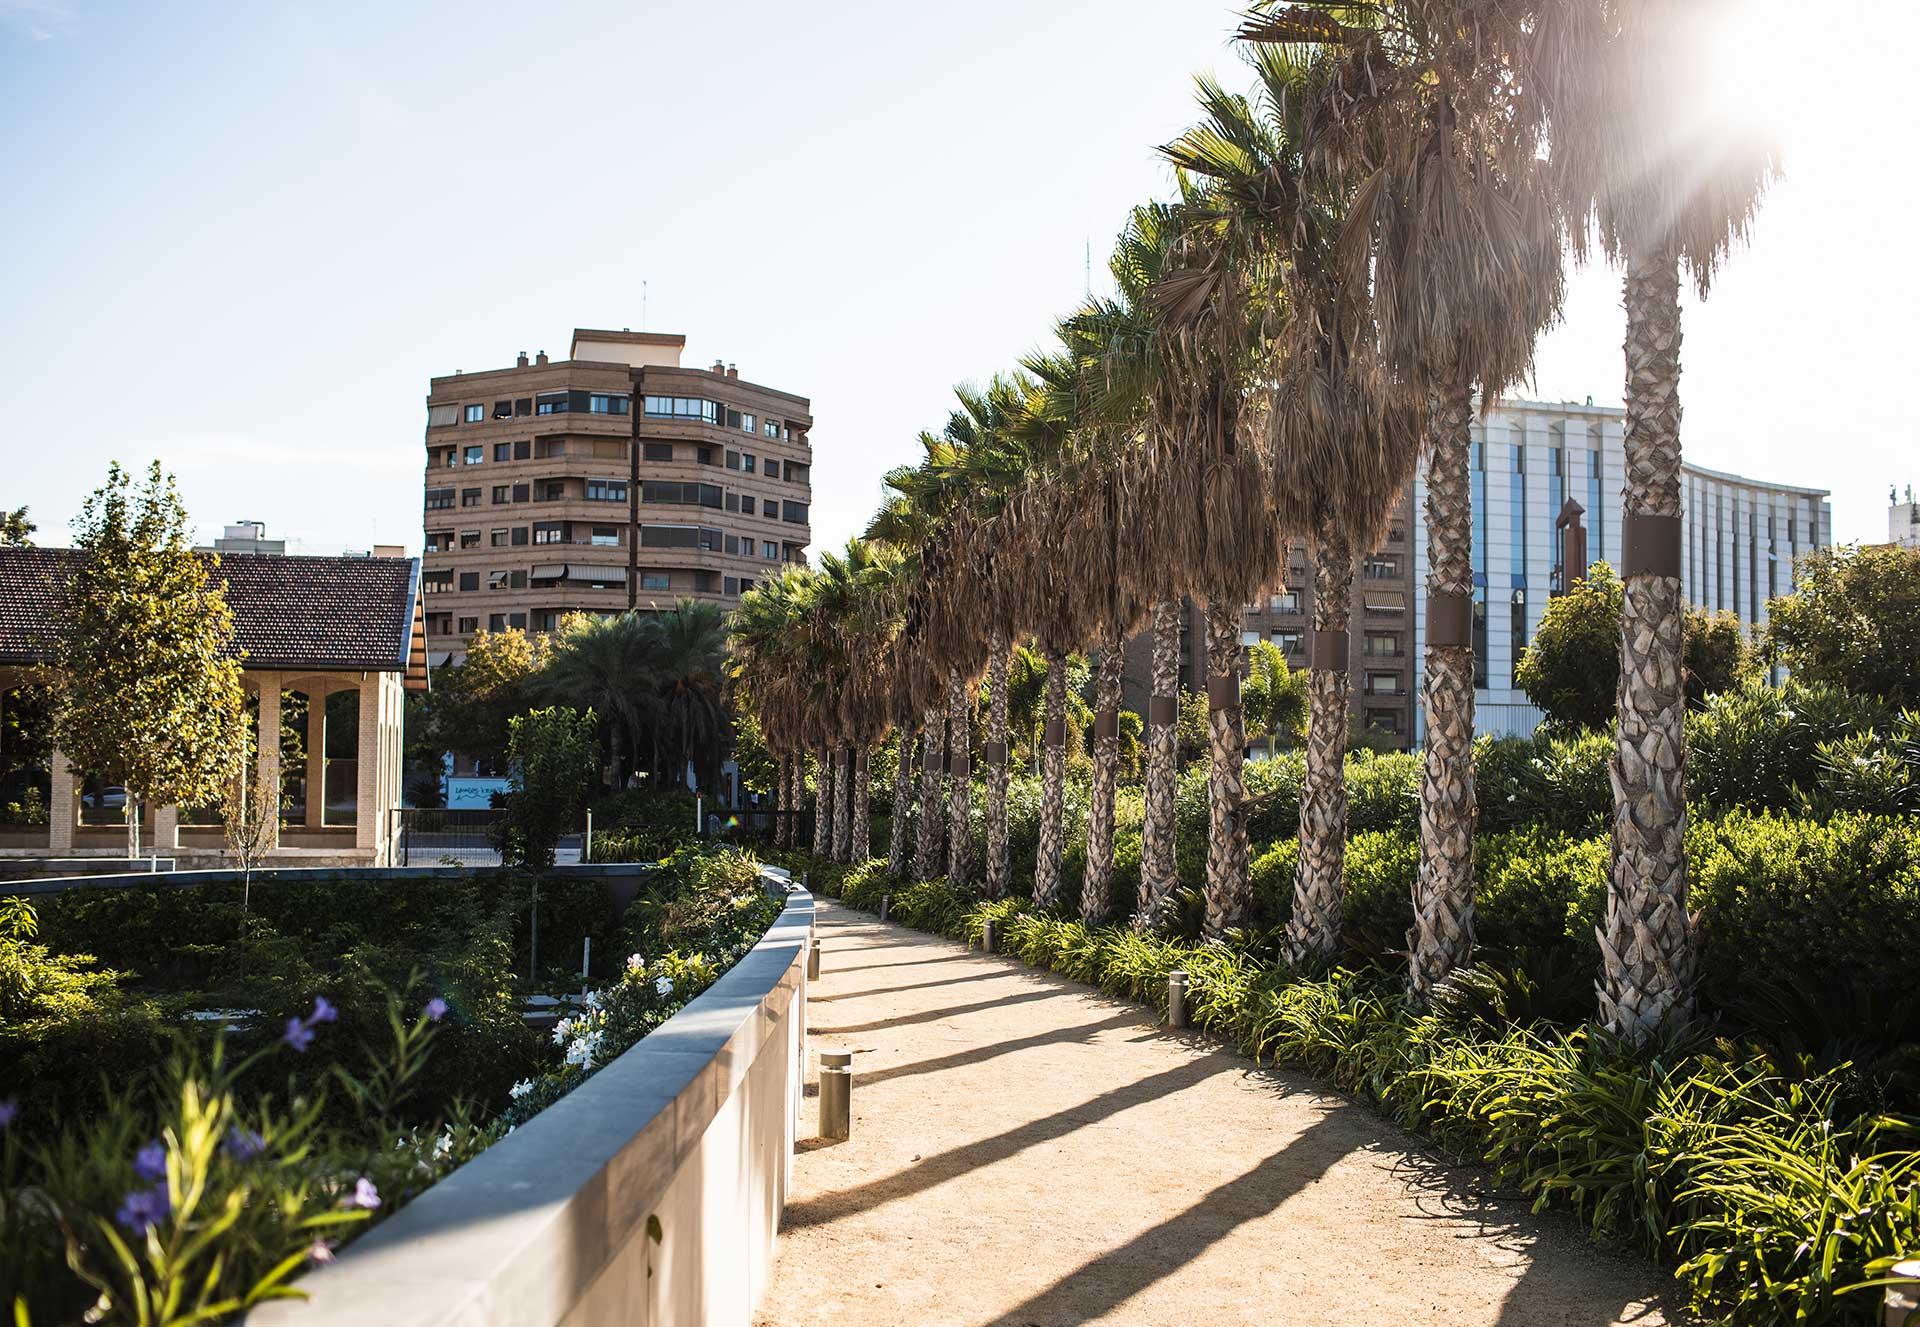 La ciudad de València ya es candidata oficial a Capital Mundial del Diseño 2022